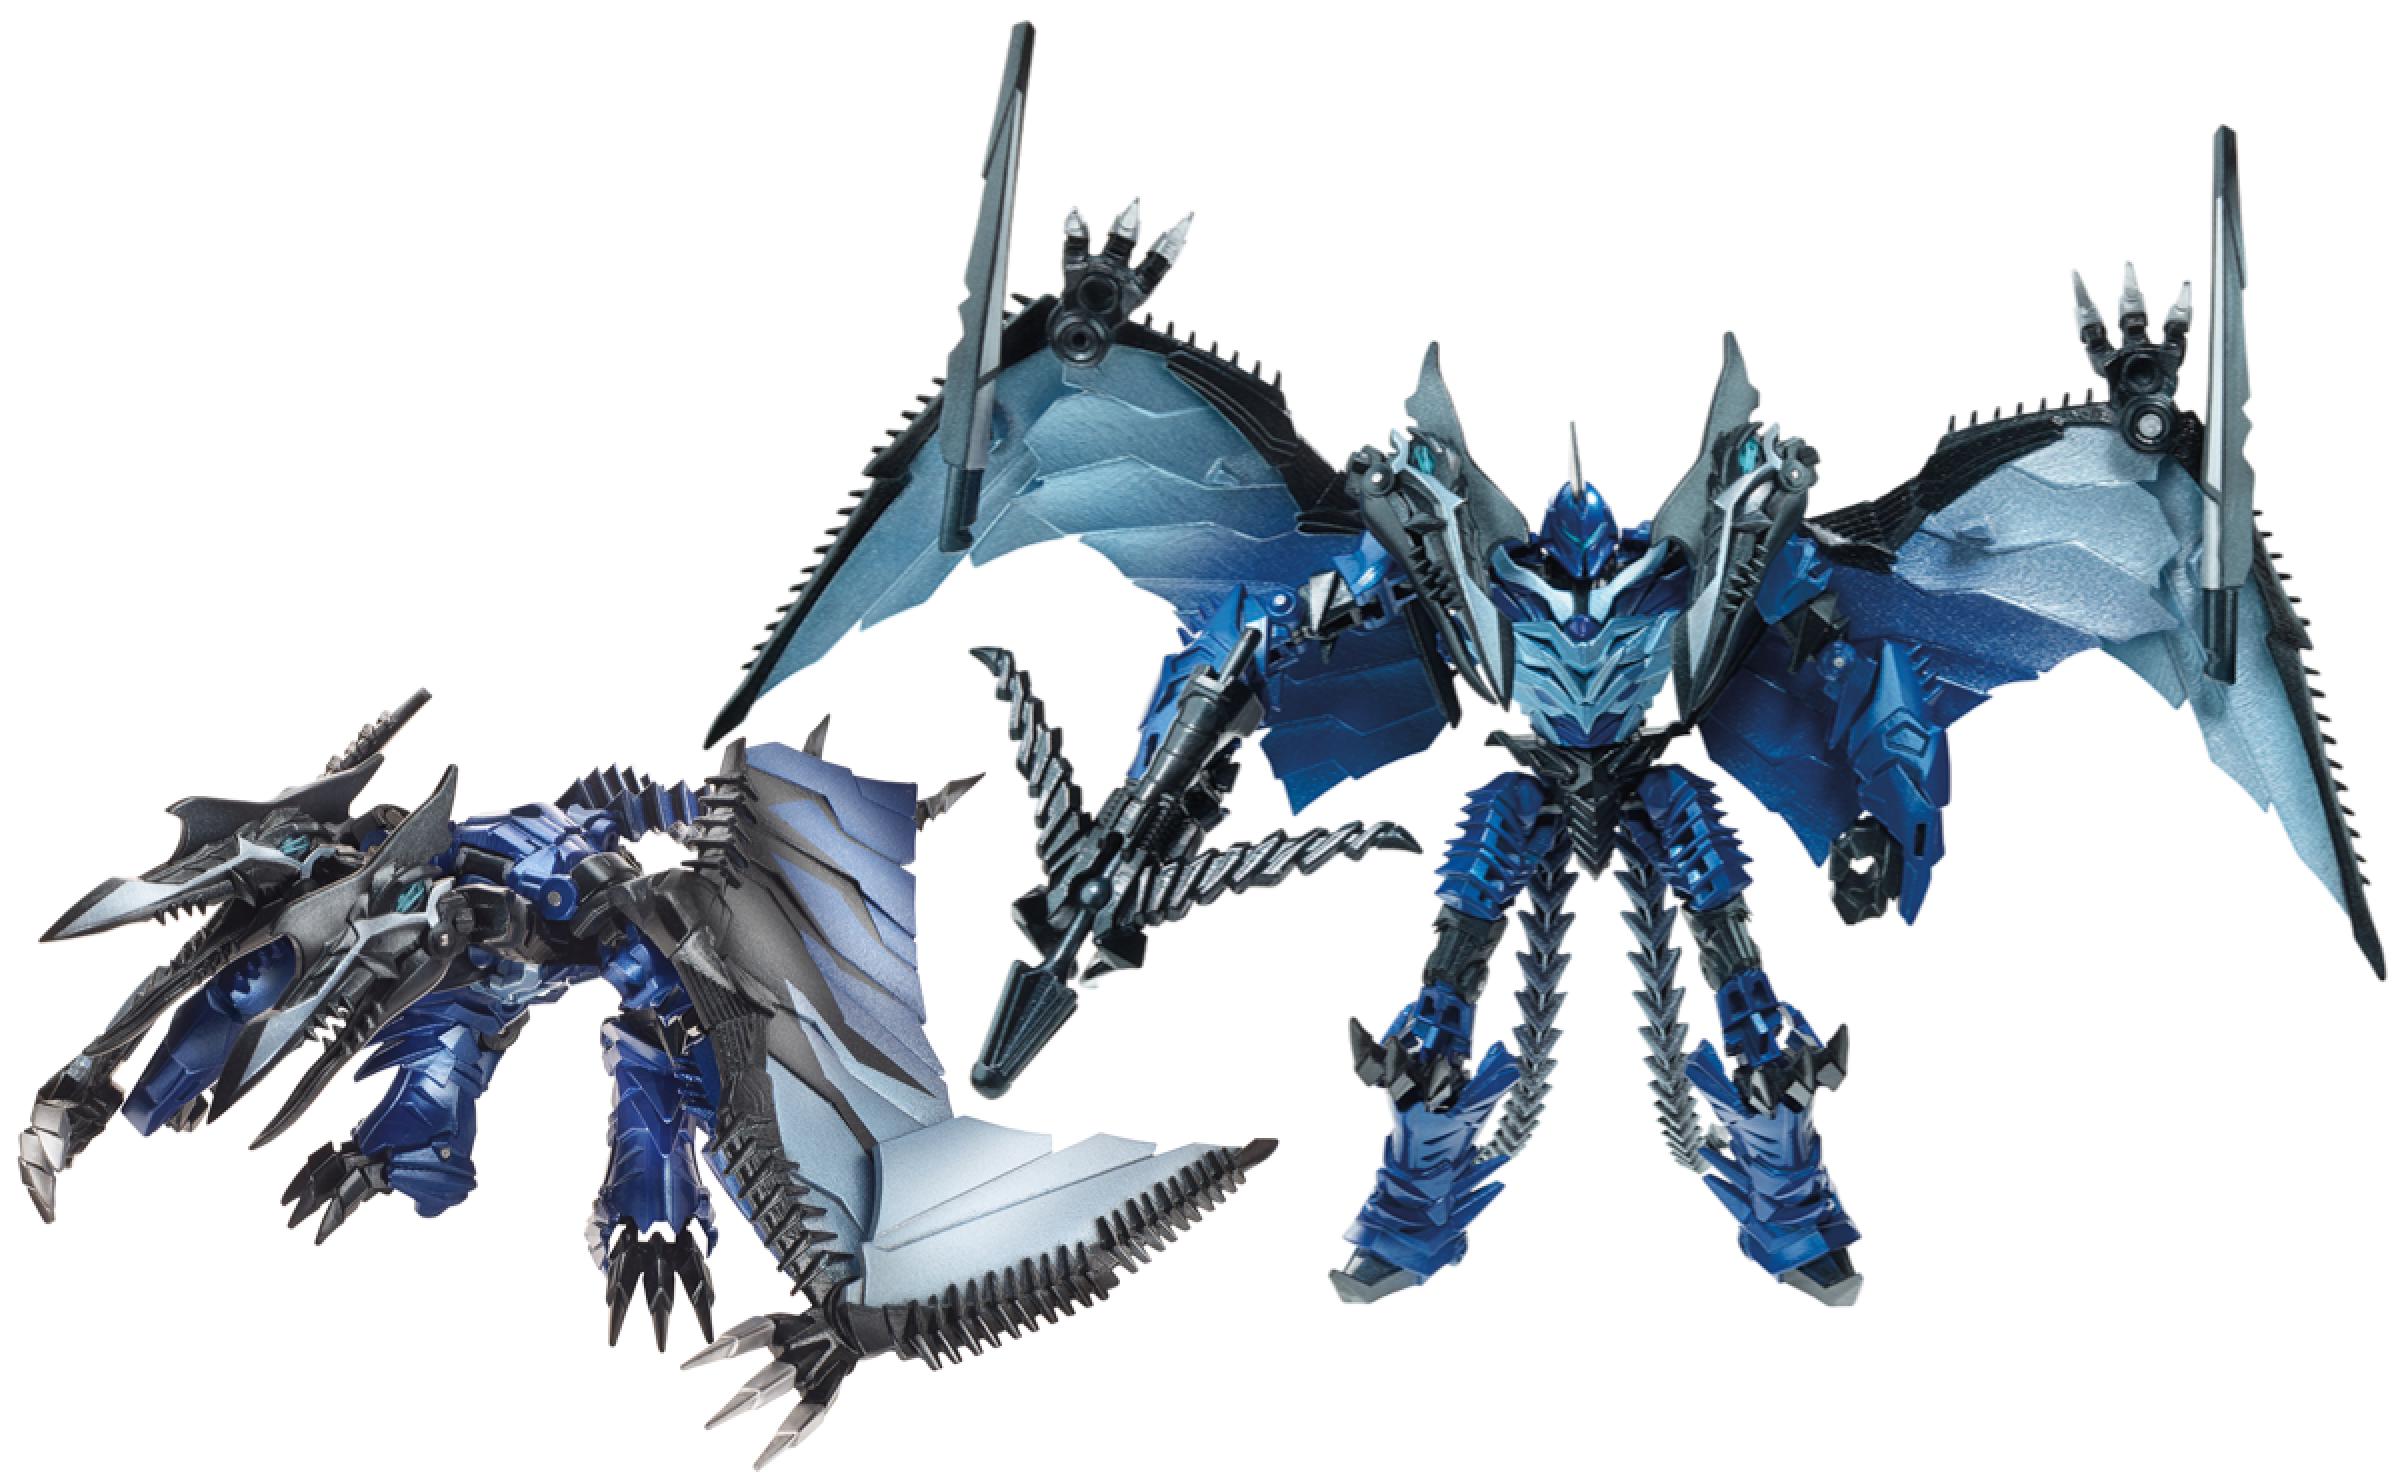 Transformers 4 Dinobots Scorn Toy